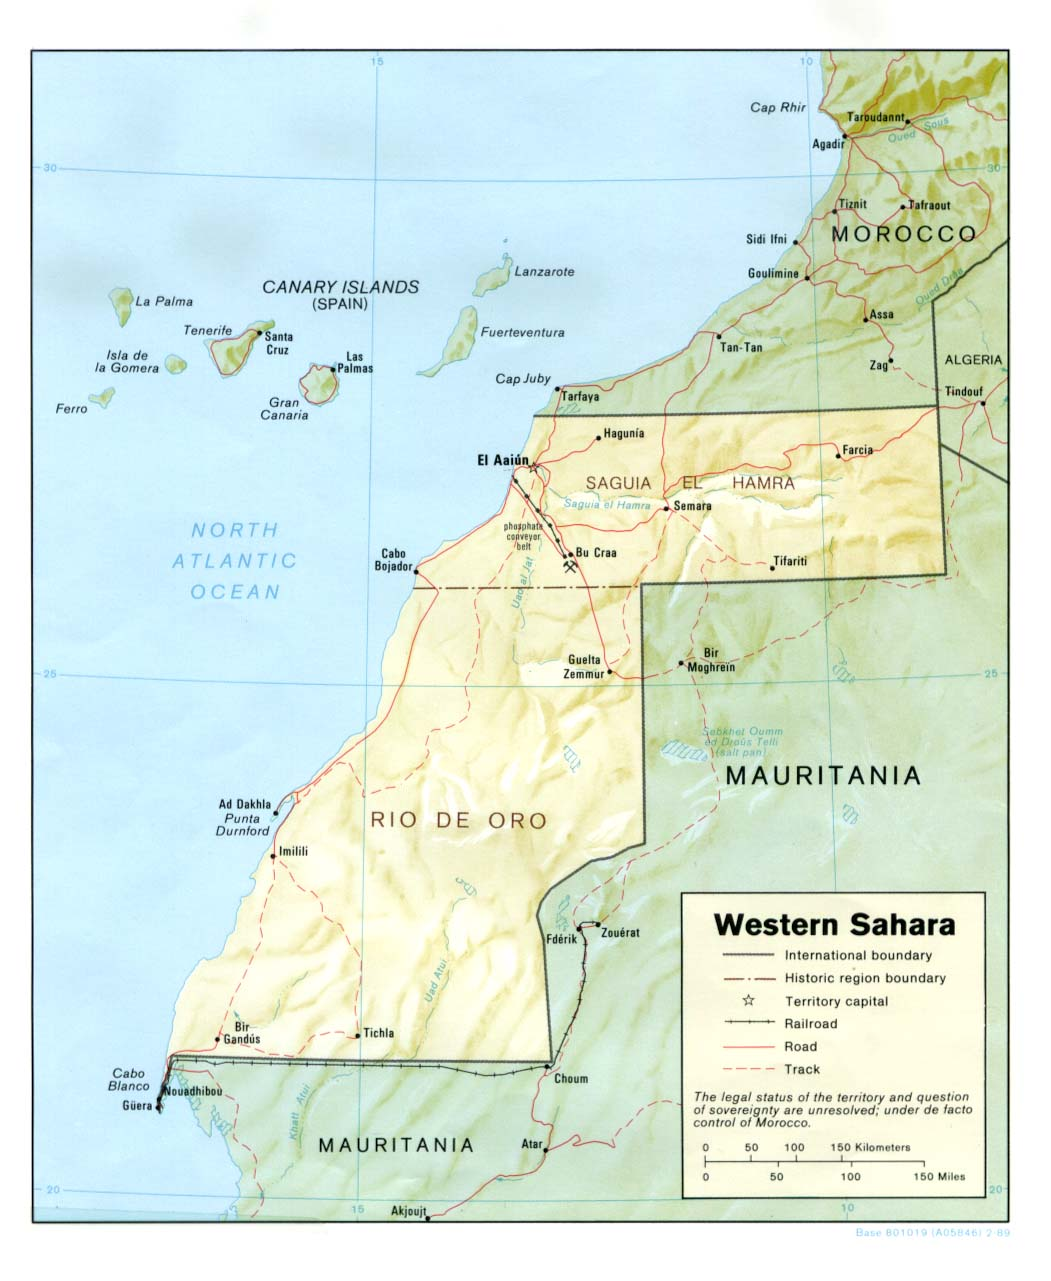 Western Sahara Republic Maps PerryCastañeda Map Collection UT - democratic republic of the clickable map